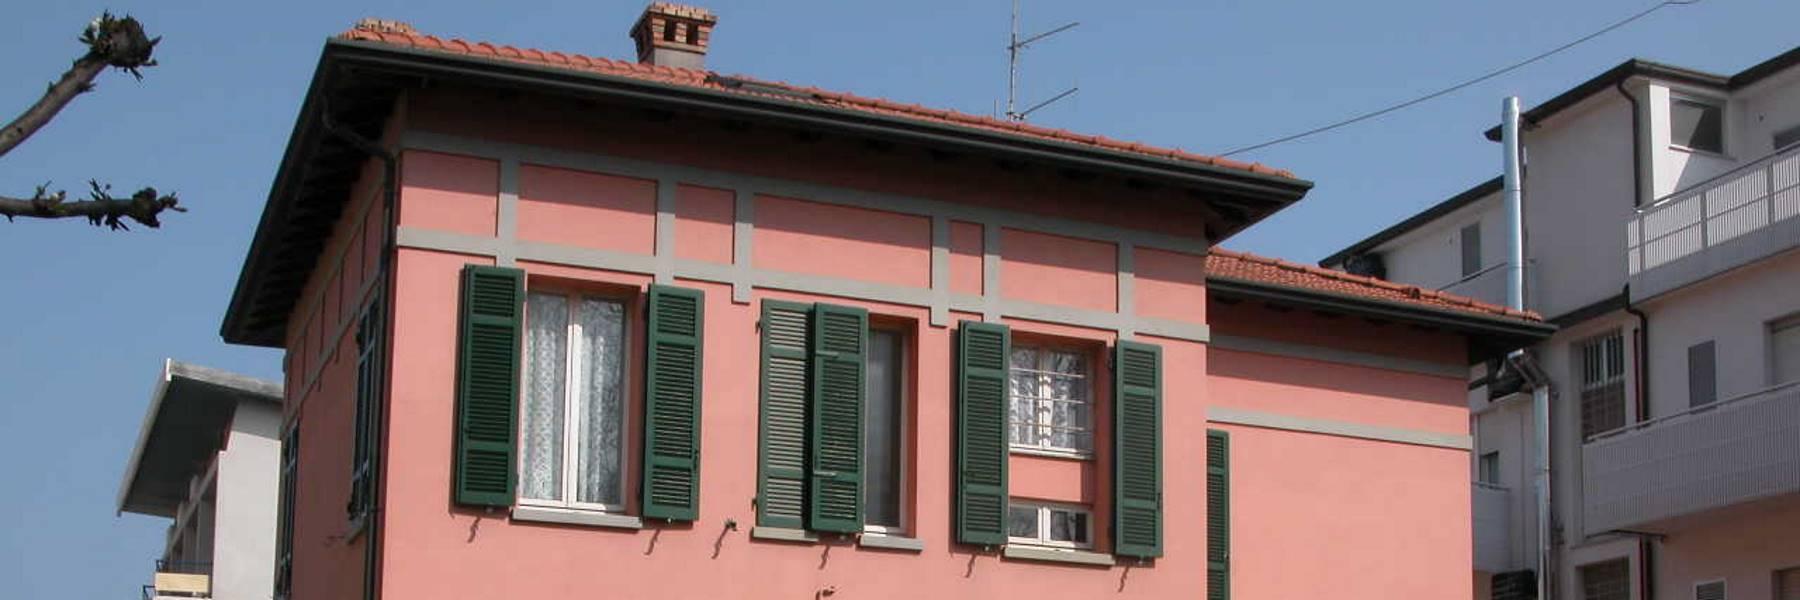 Haus von Grazia Deledda